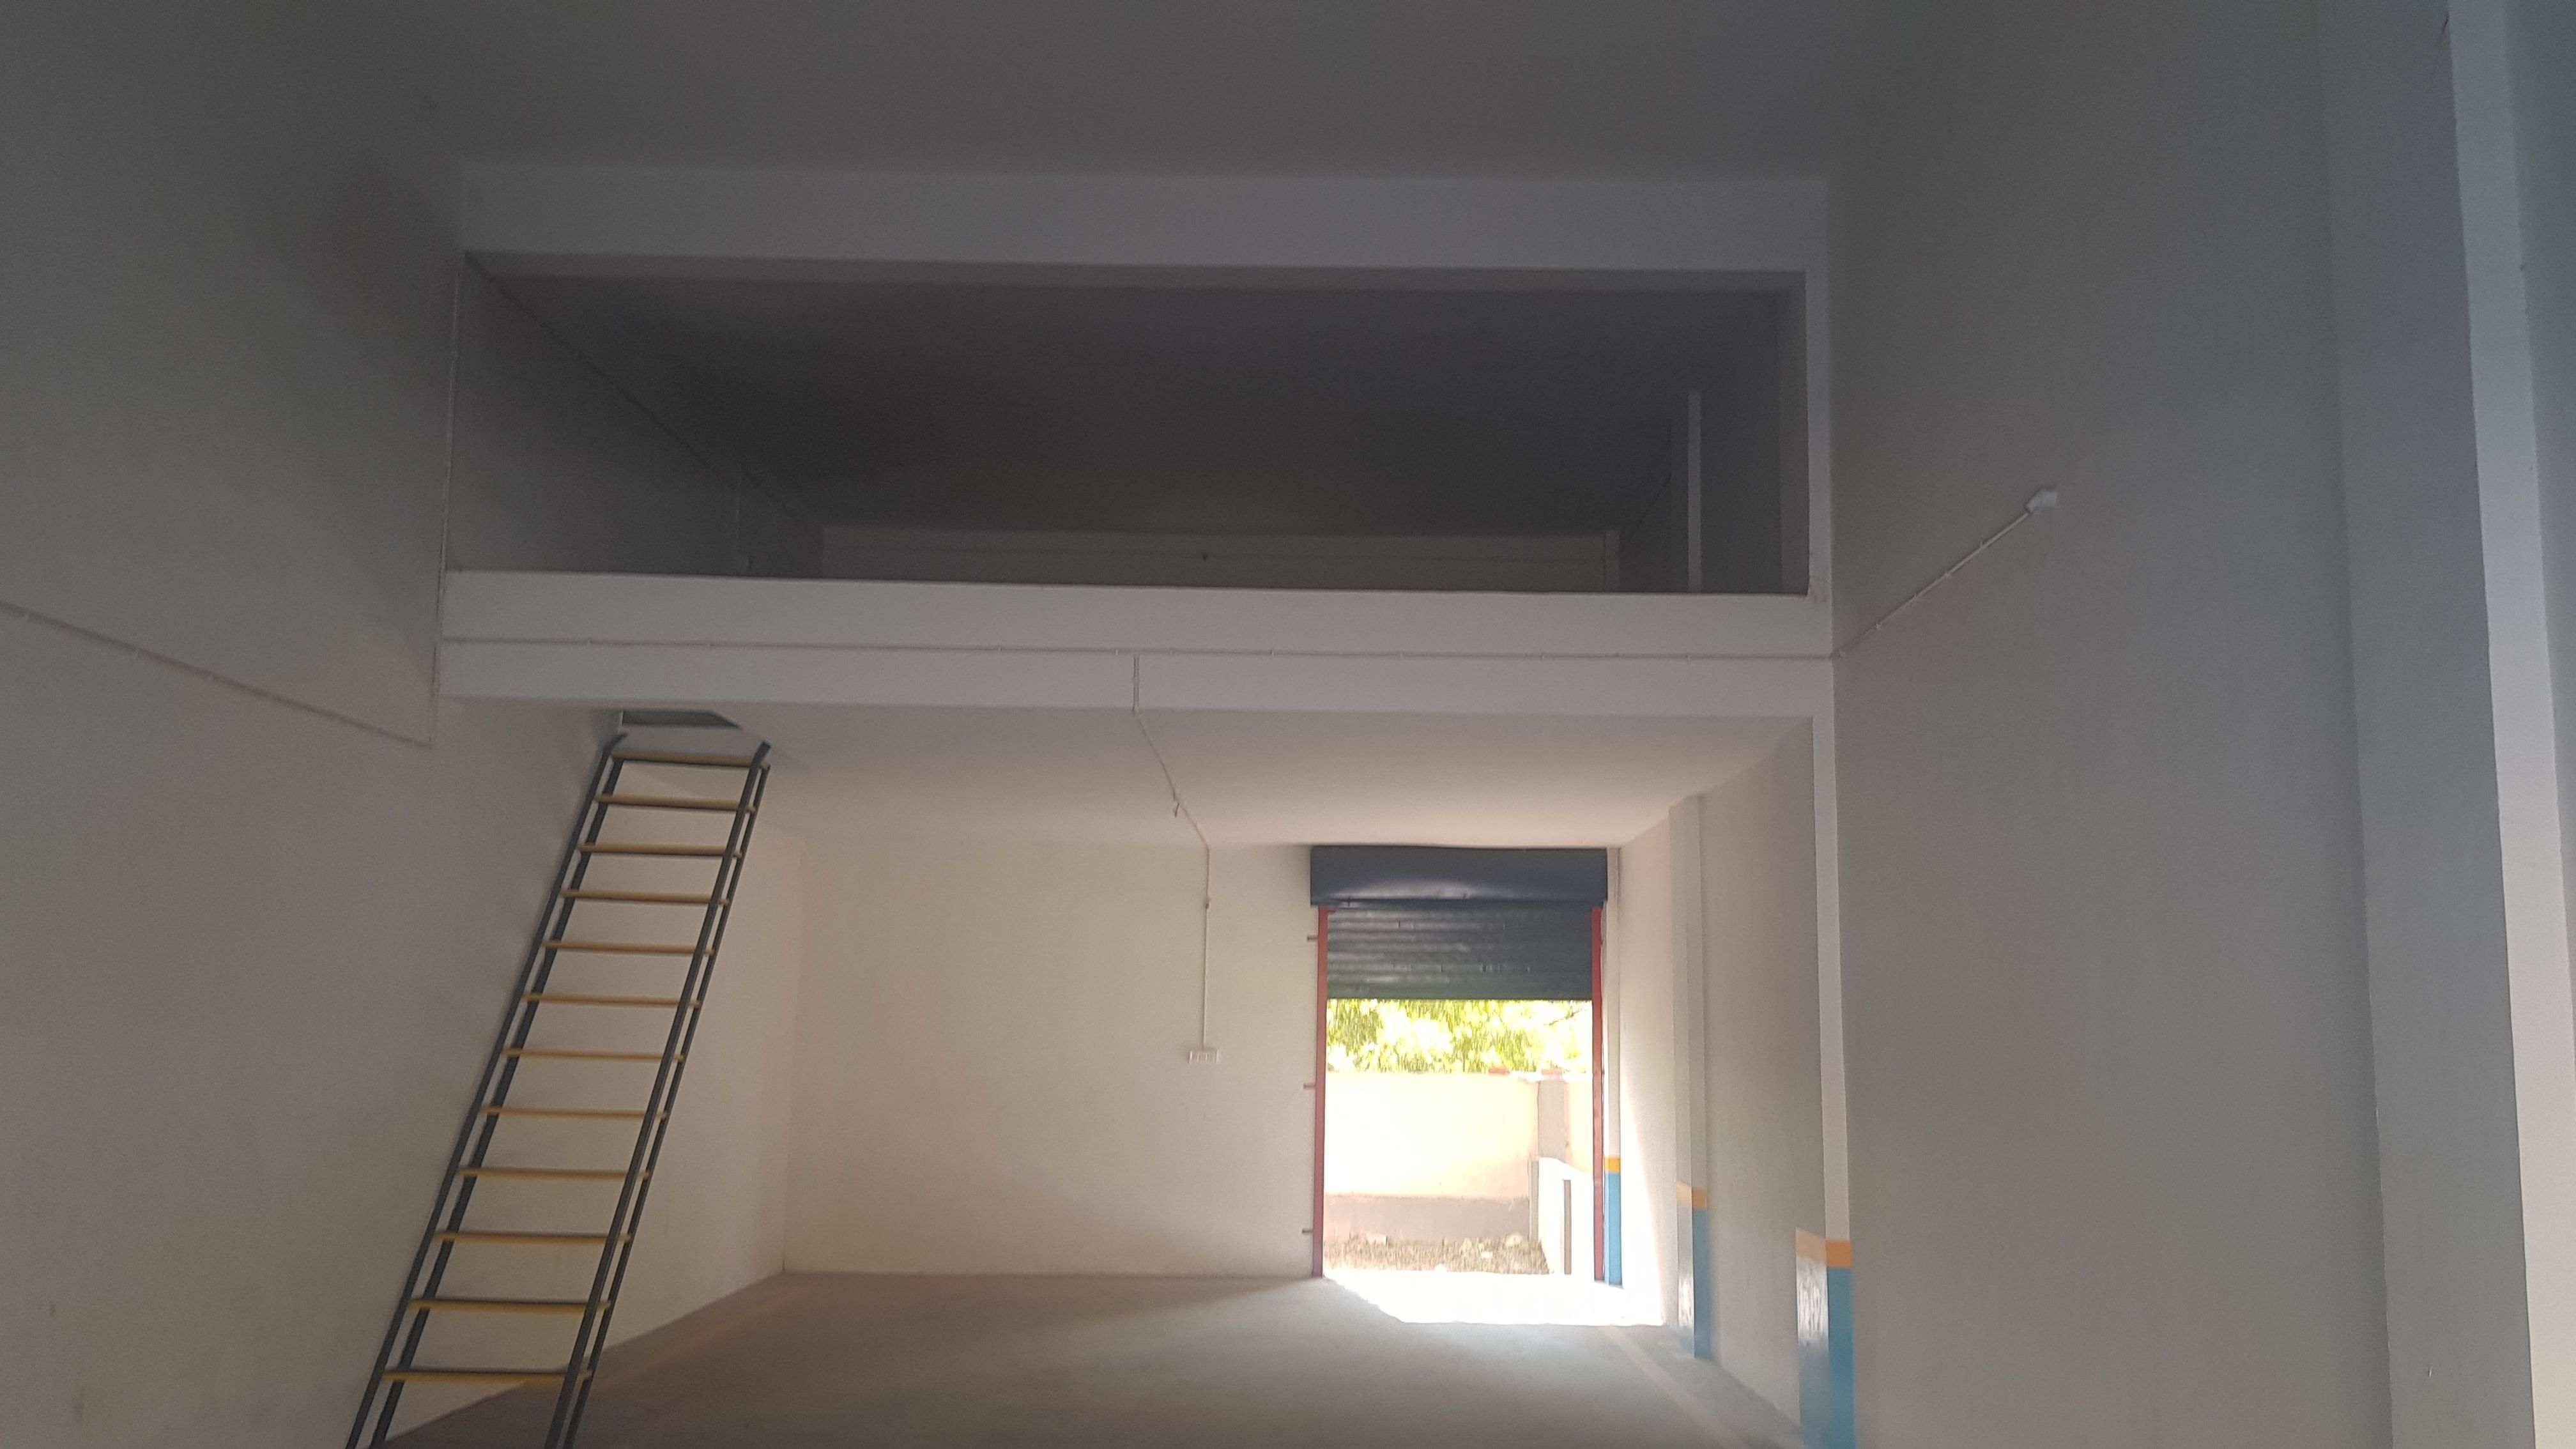 Warehouse For Rent In Changodar Indiawarehousing Rent Warehouse Lease